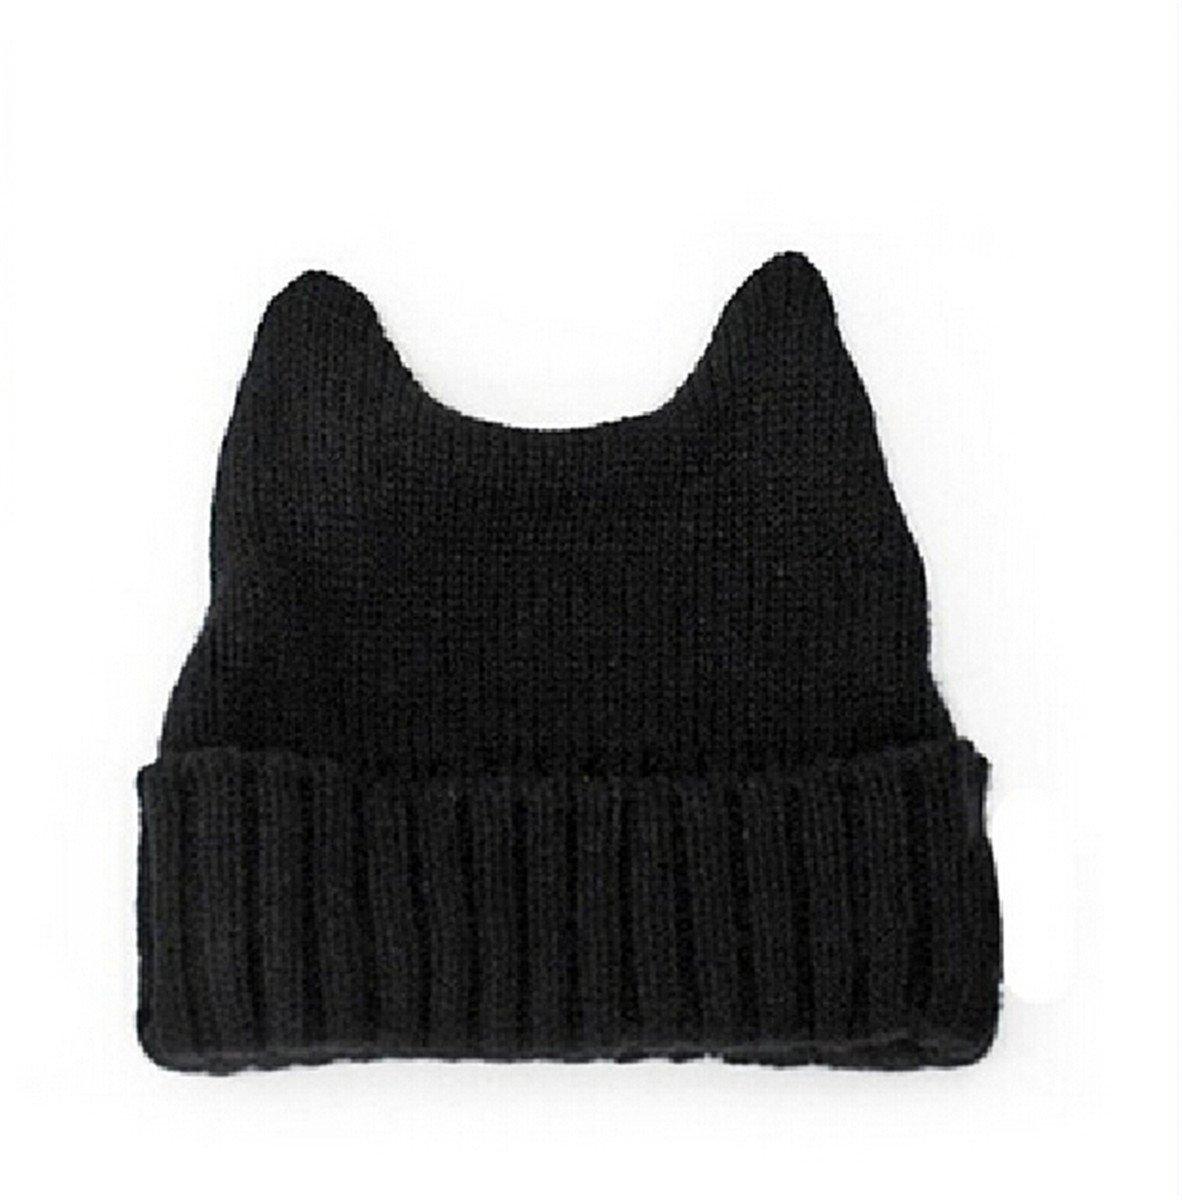 77d9633462bb5d Get Quotations · Dealzip Inc Stylish Unisex Winter Warm Wool Crochet Knitted  Hat Cap Cute Cat Ears Design